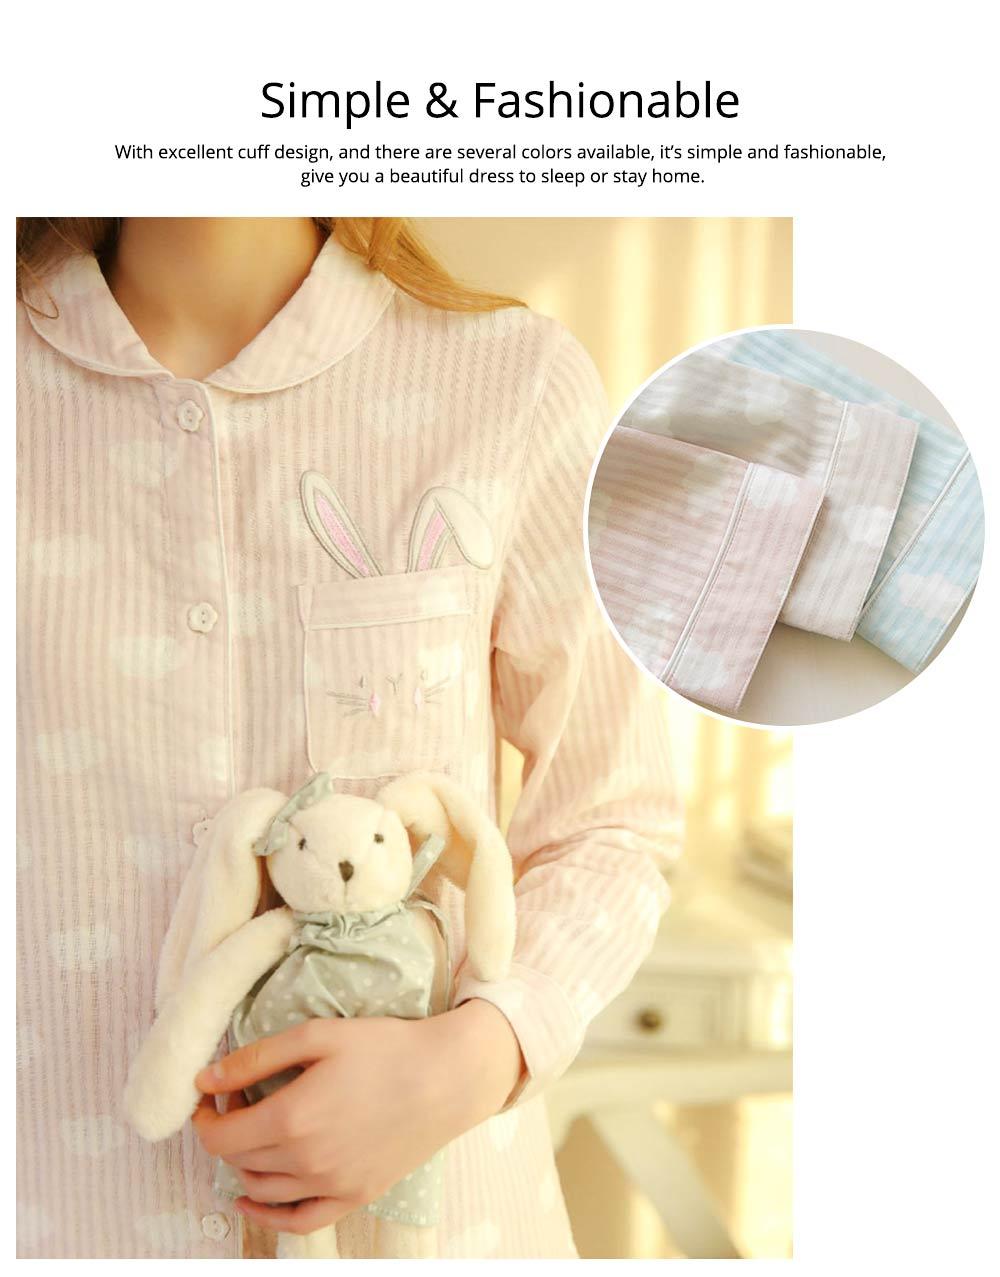 Sleepwear Fashionable Pajamas Set for Girl, Women Soft Long Sleeves Cotton Nightgown 5